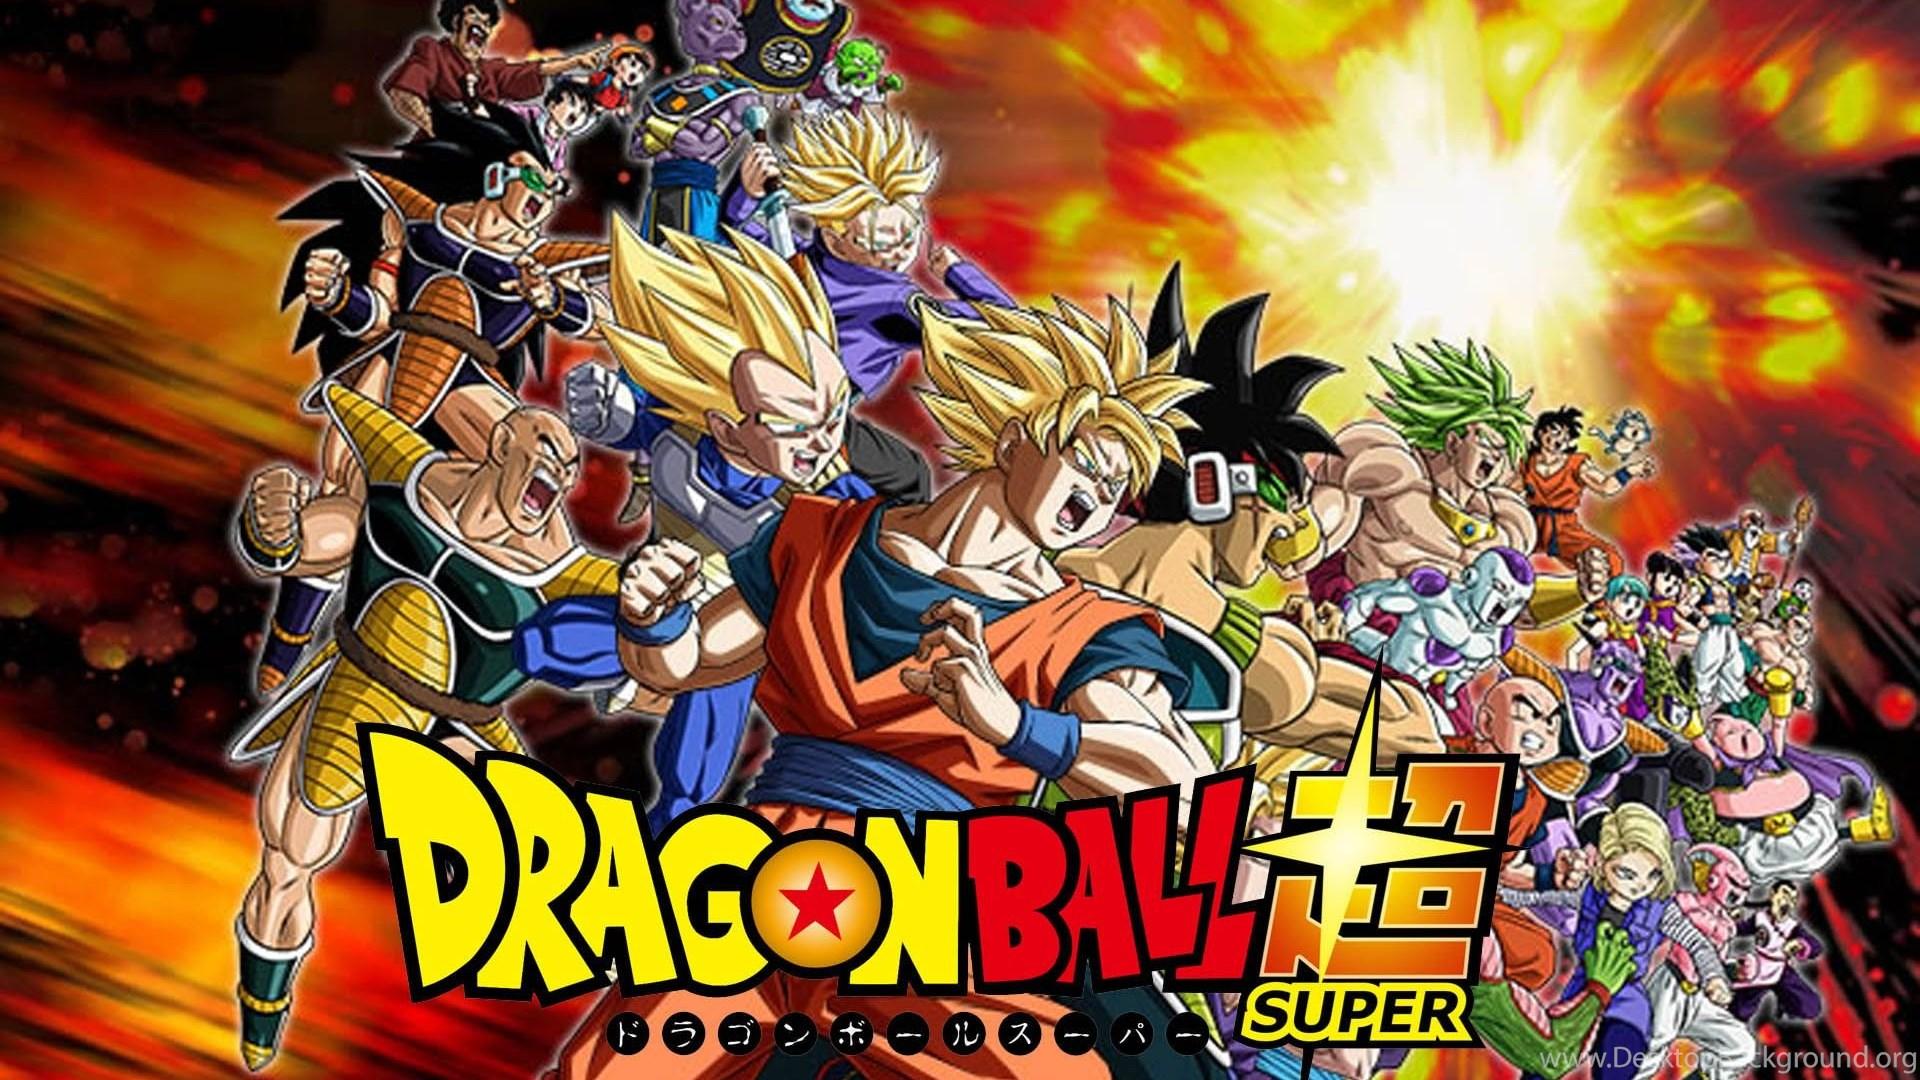 Dragon Ball Super Wallpapers Hd Free Download Desktop